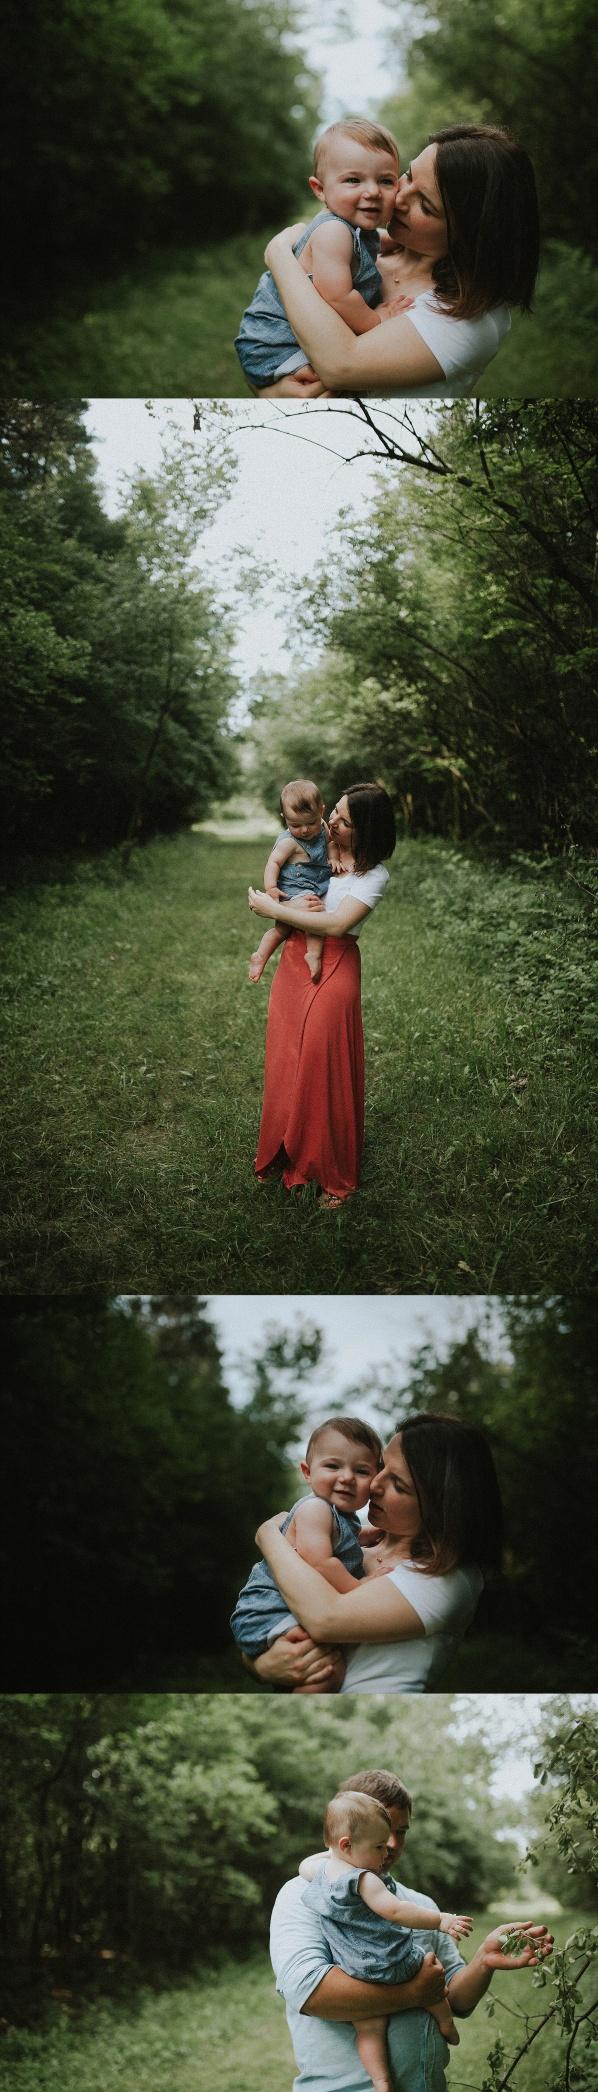 ADRI DE LA CRUZ CHICAGO AND WEST SUBURBS FAMILY PHOTOGRAPHER (3)